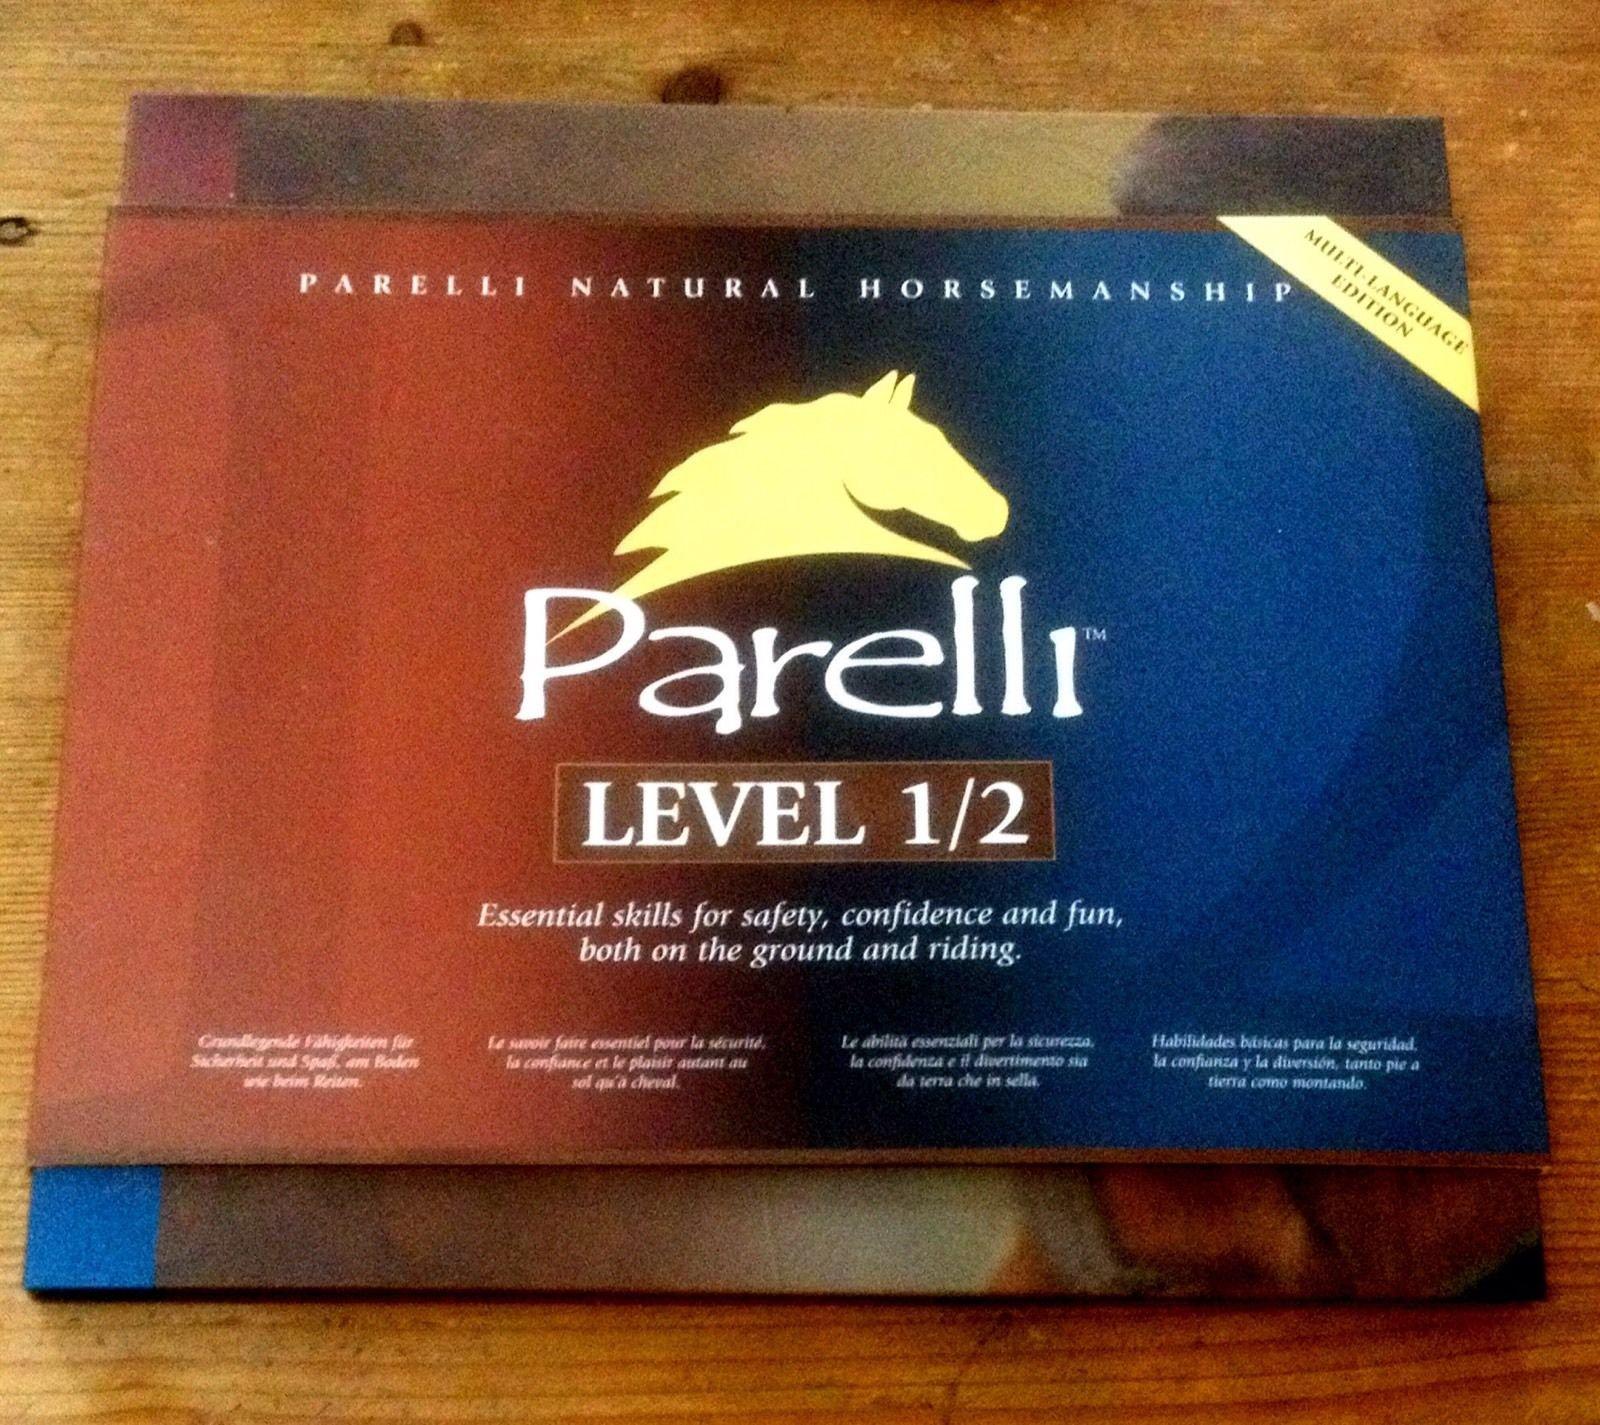 Parelli Horsemanship Natural Level 1 & 2, Multi-language Edition (3 Dvd) ebook